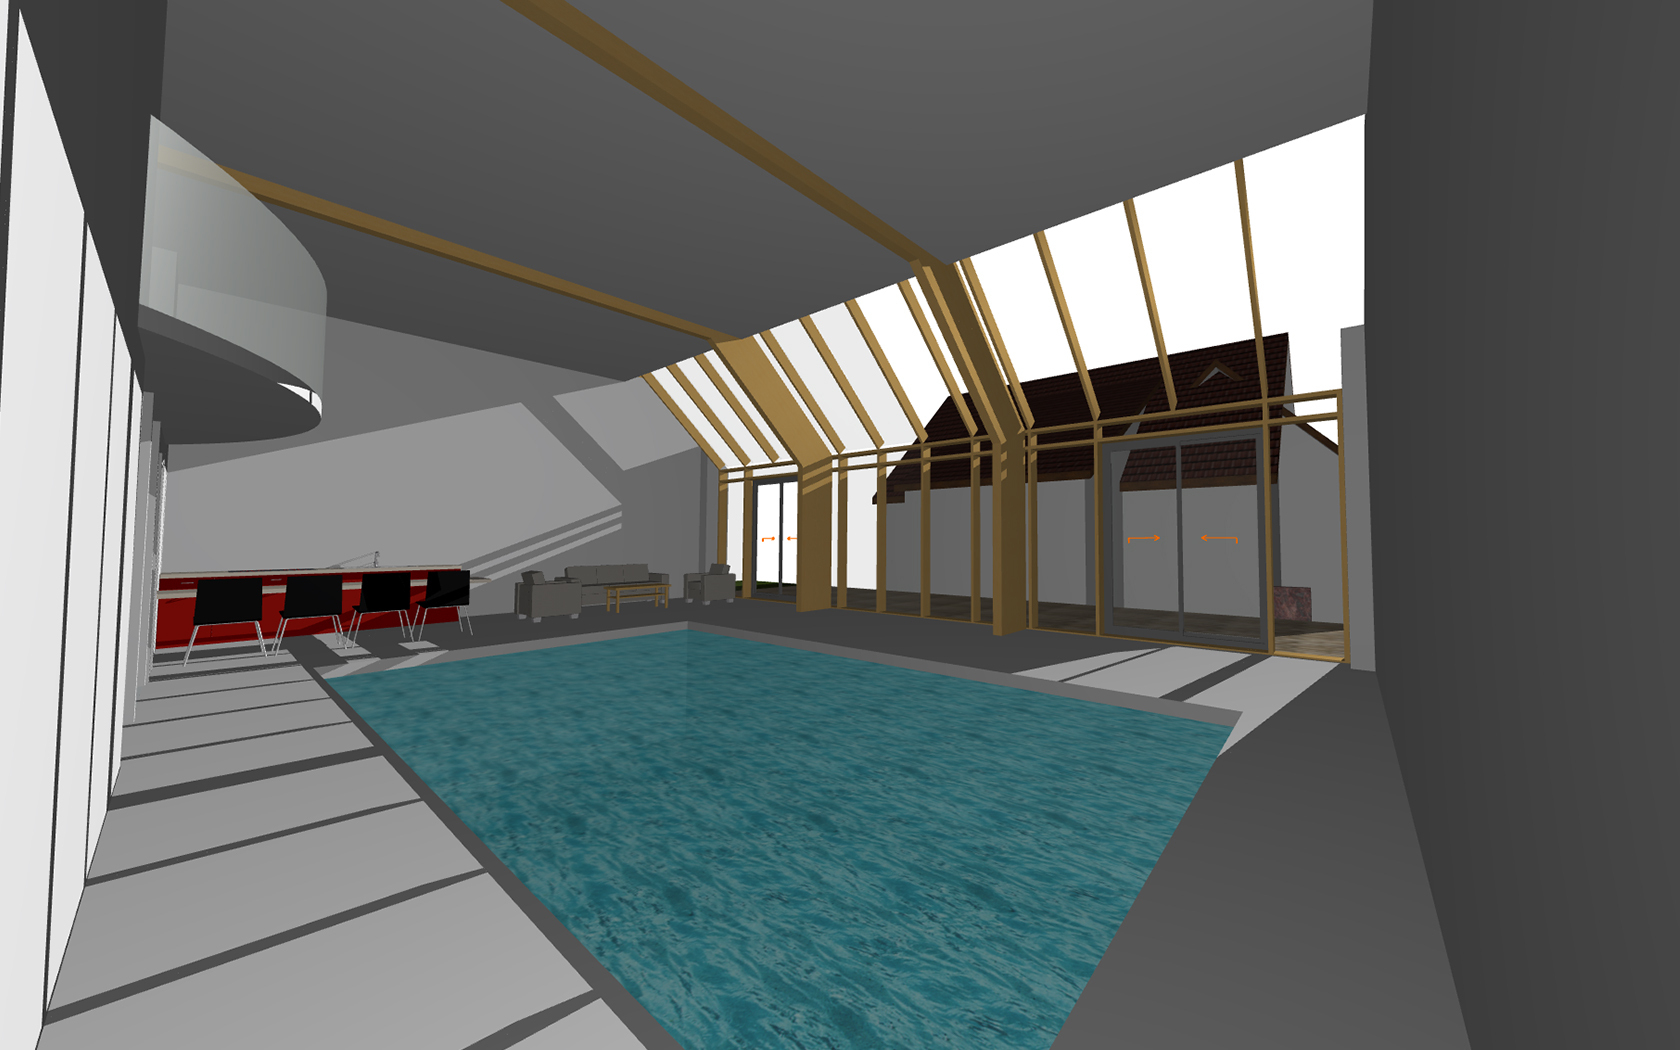 Piscine Couverte Europassive® 5 Re - Architecture K.m.o. pour Piscine Bouxwiller